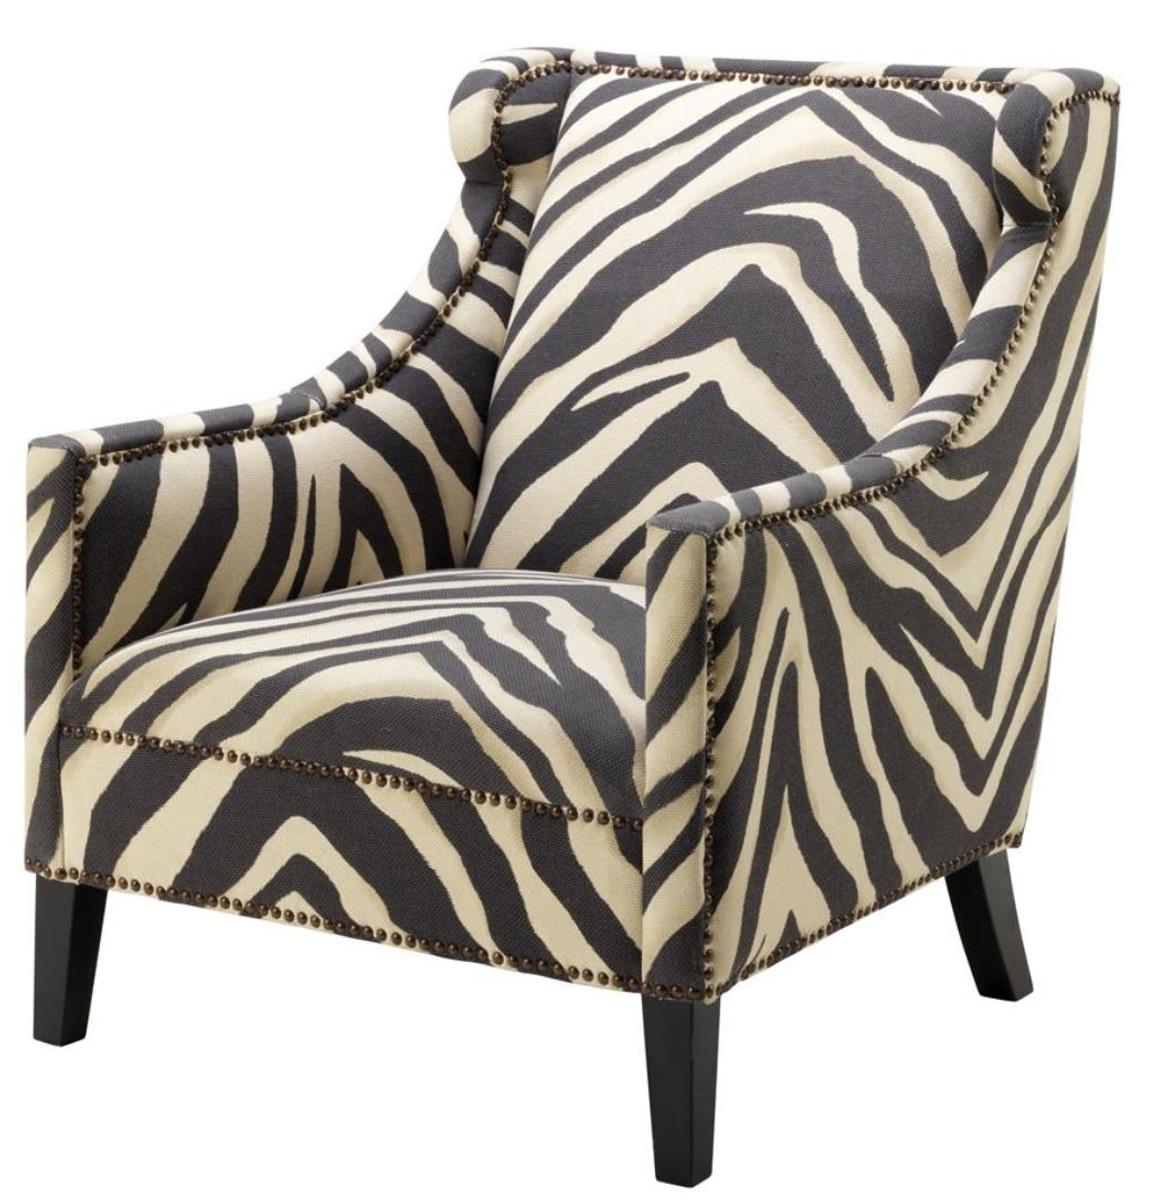 Casa Cm 81 Luxus Im Sessel Padrino X Zebra Design 74 H89 HEW29IDY